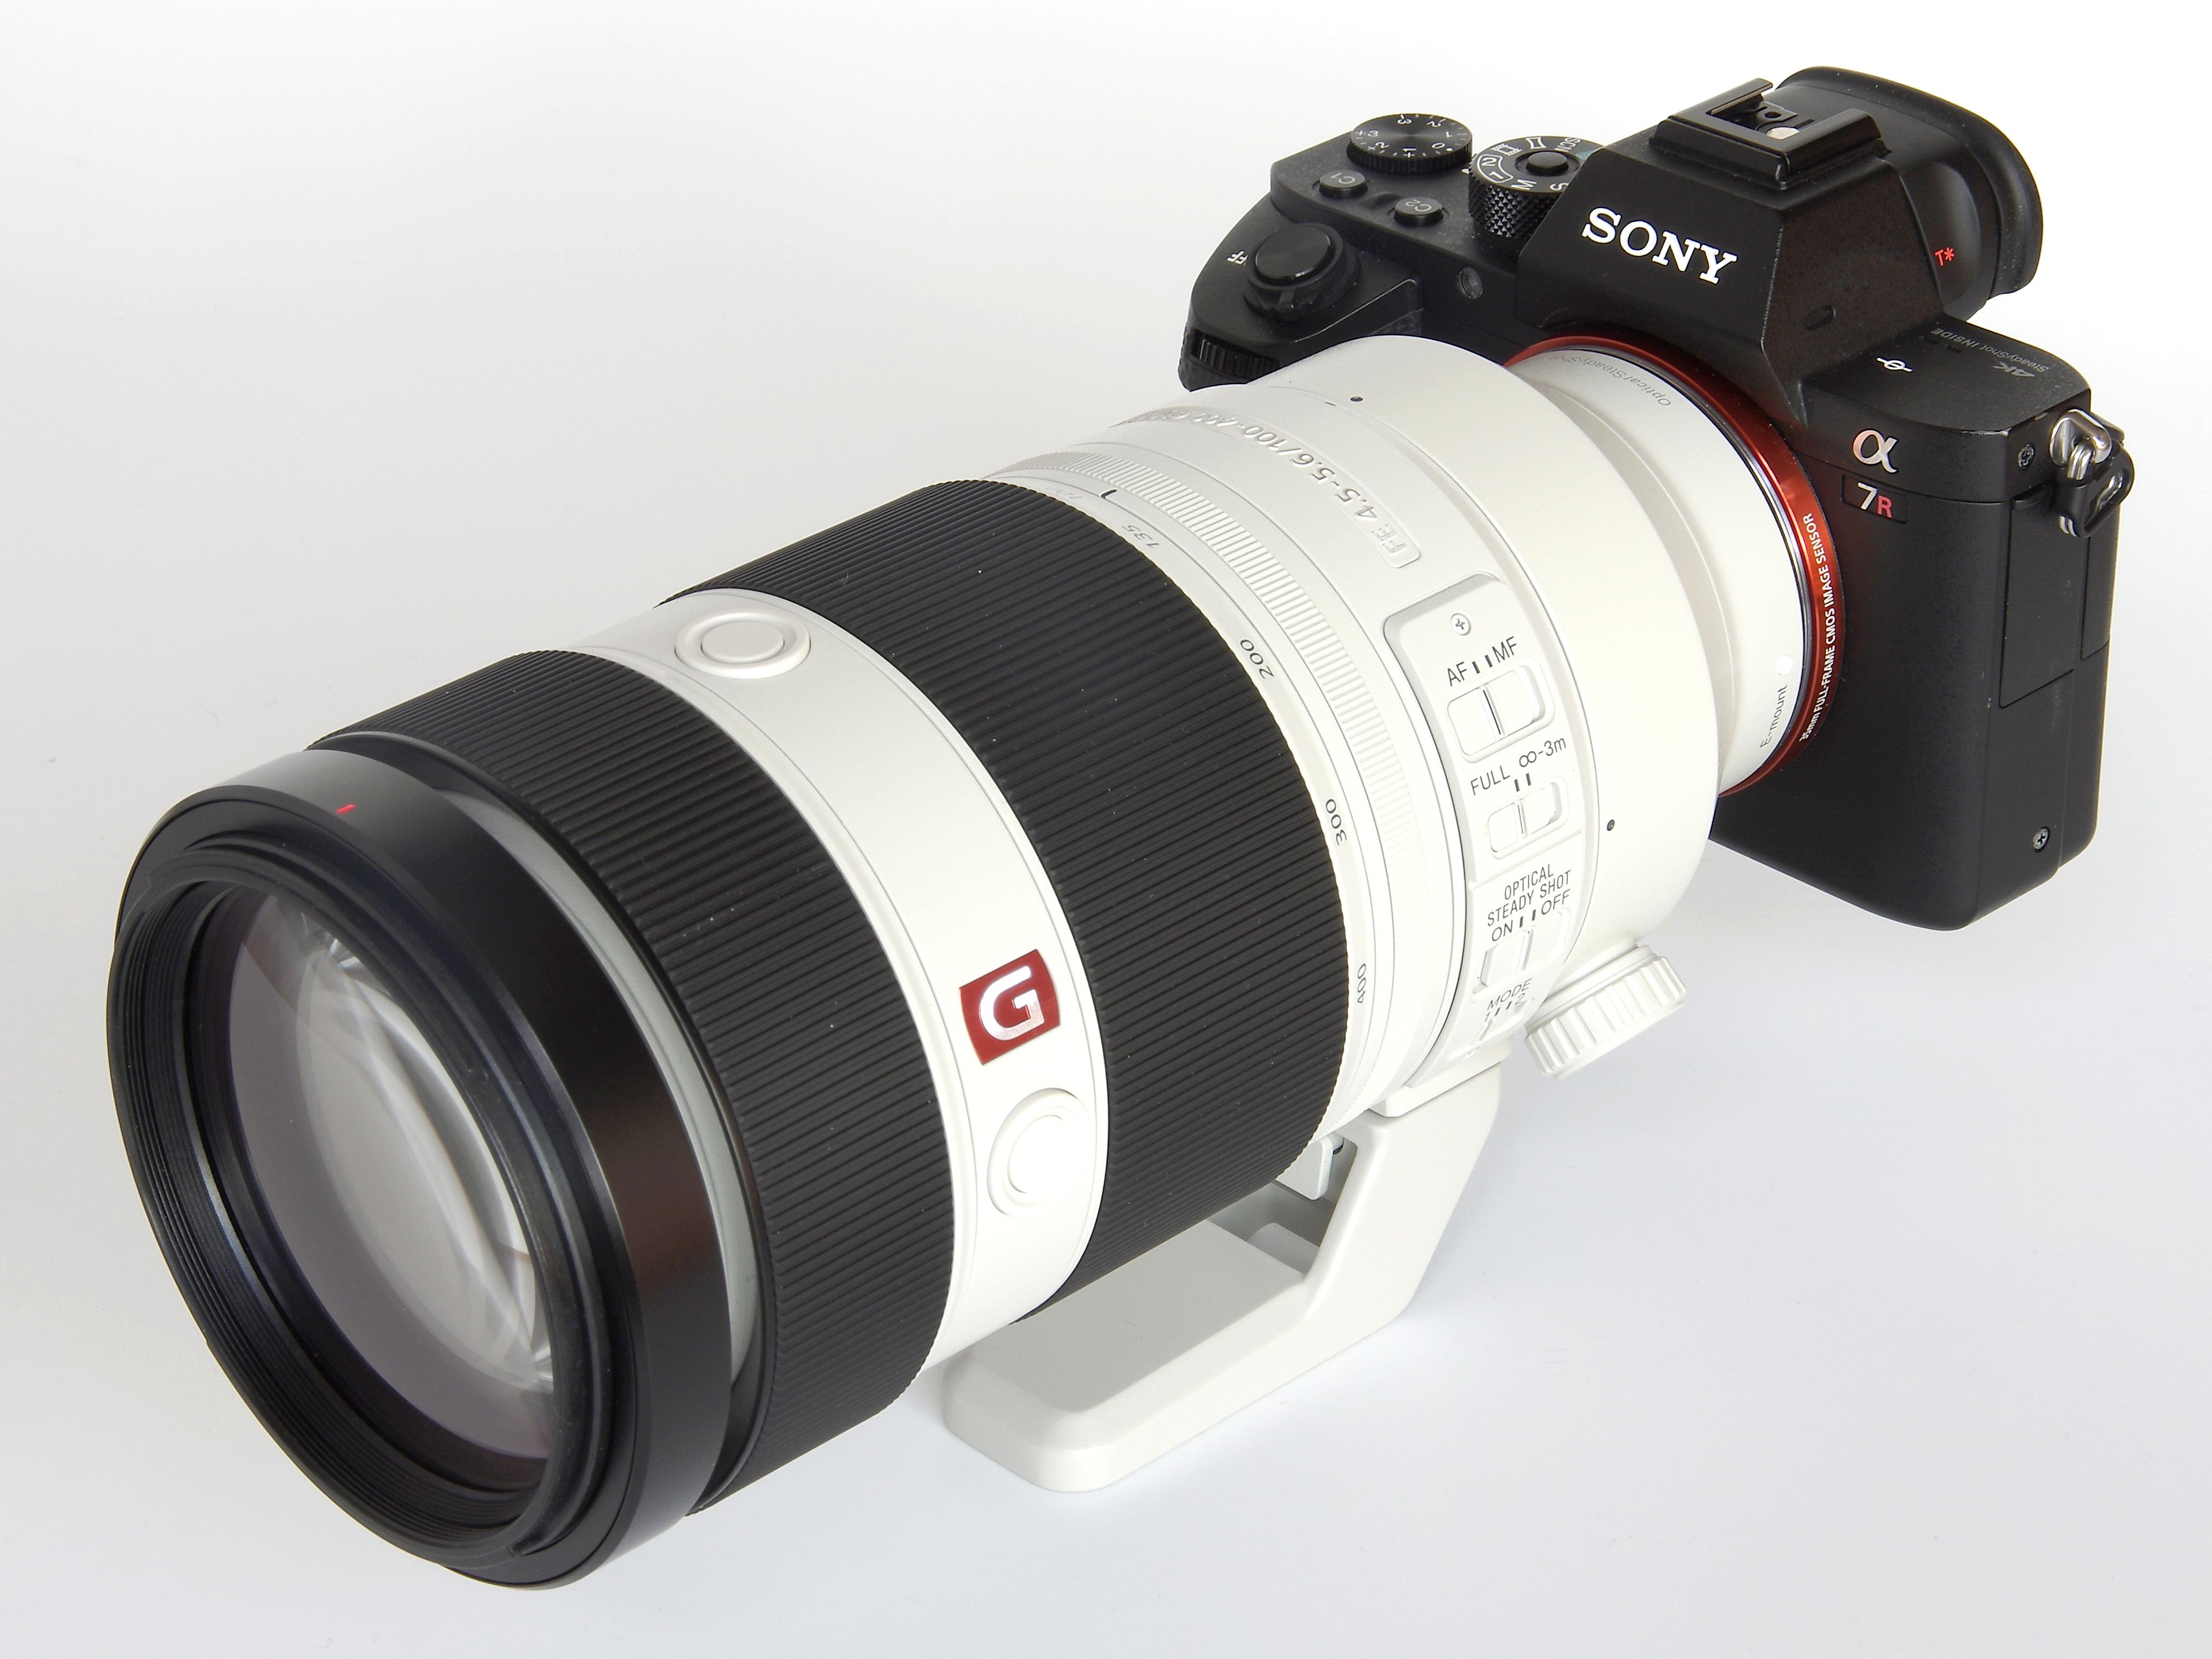 Sony FE 100-400mm f/4.5-5.6 G Master OSS Review